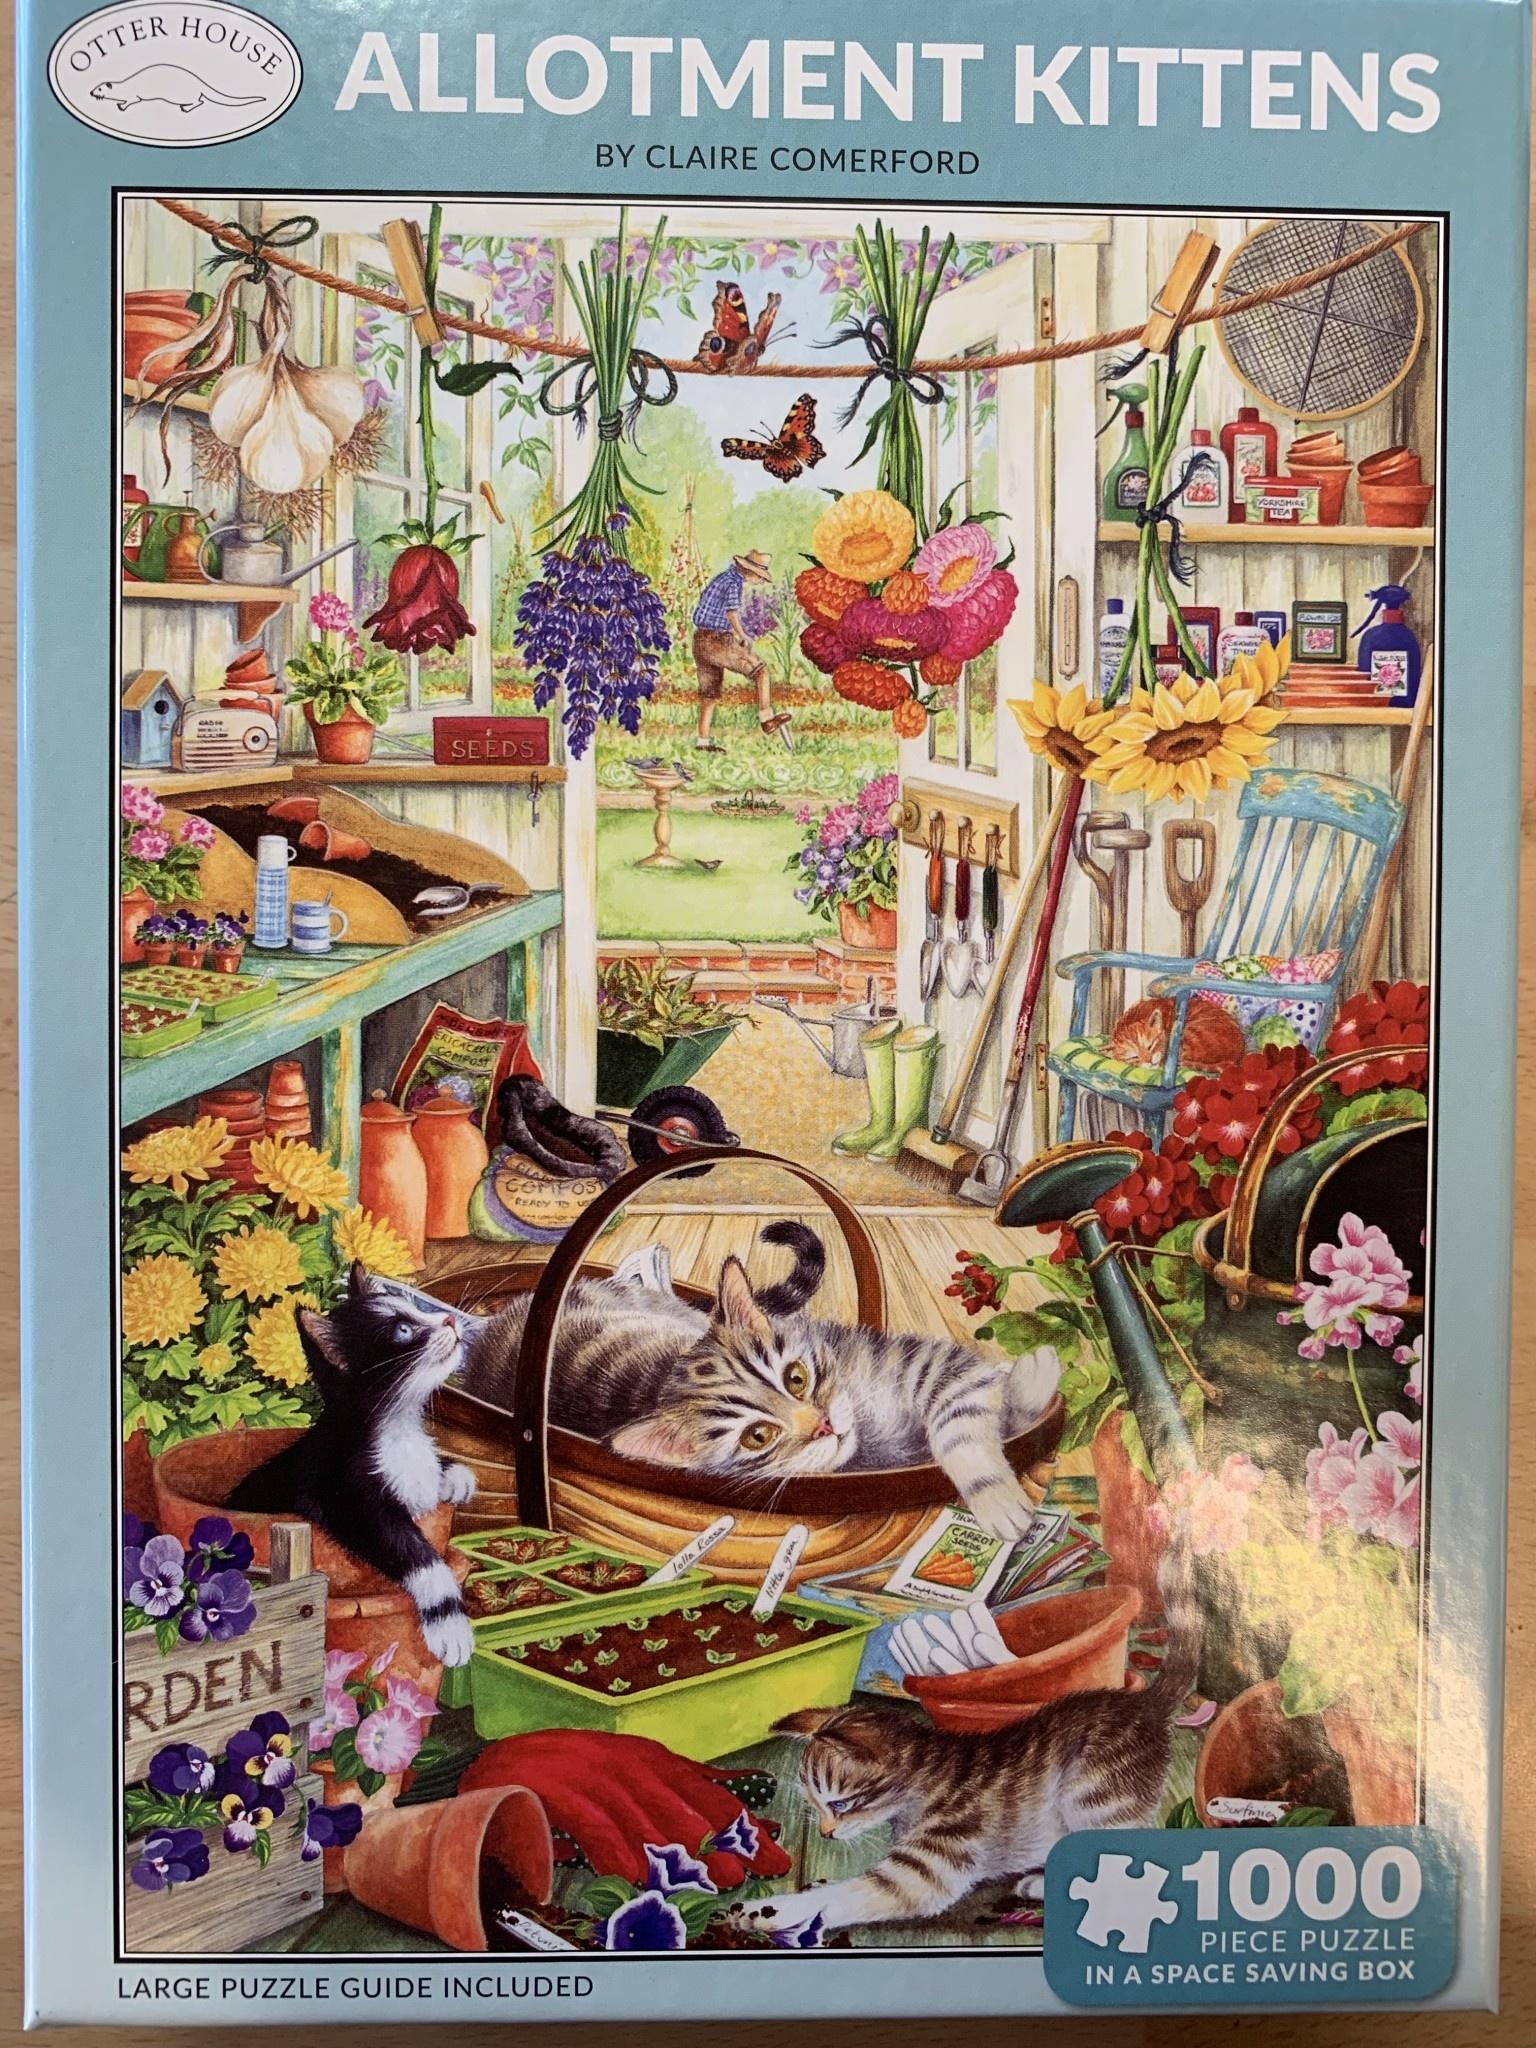 1000pcs - Allotment Kittens - Puzzle